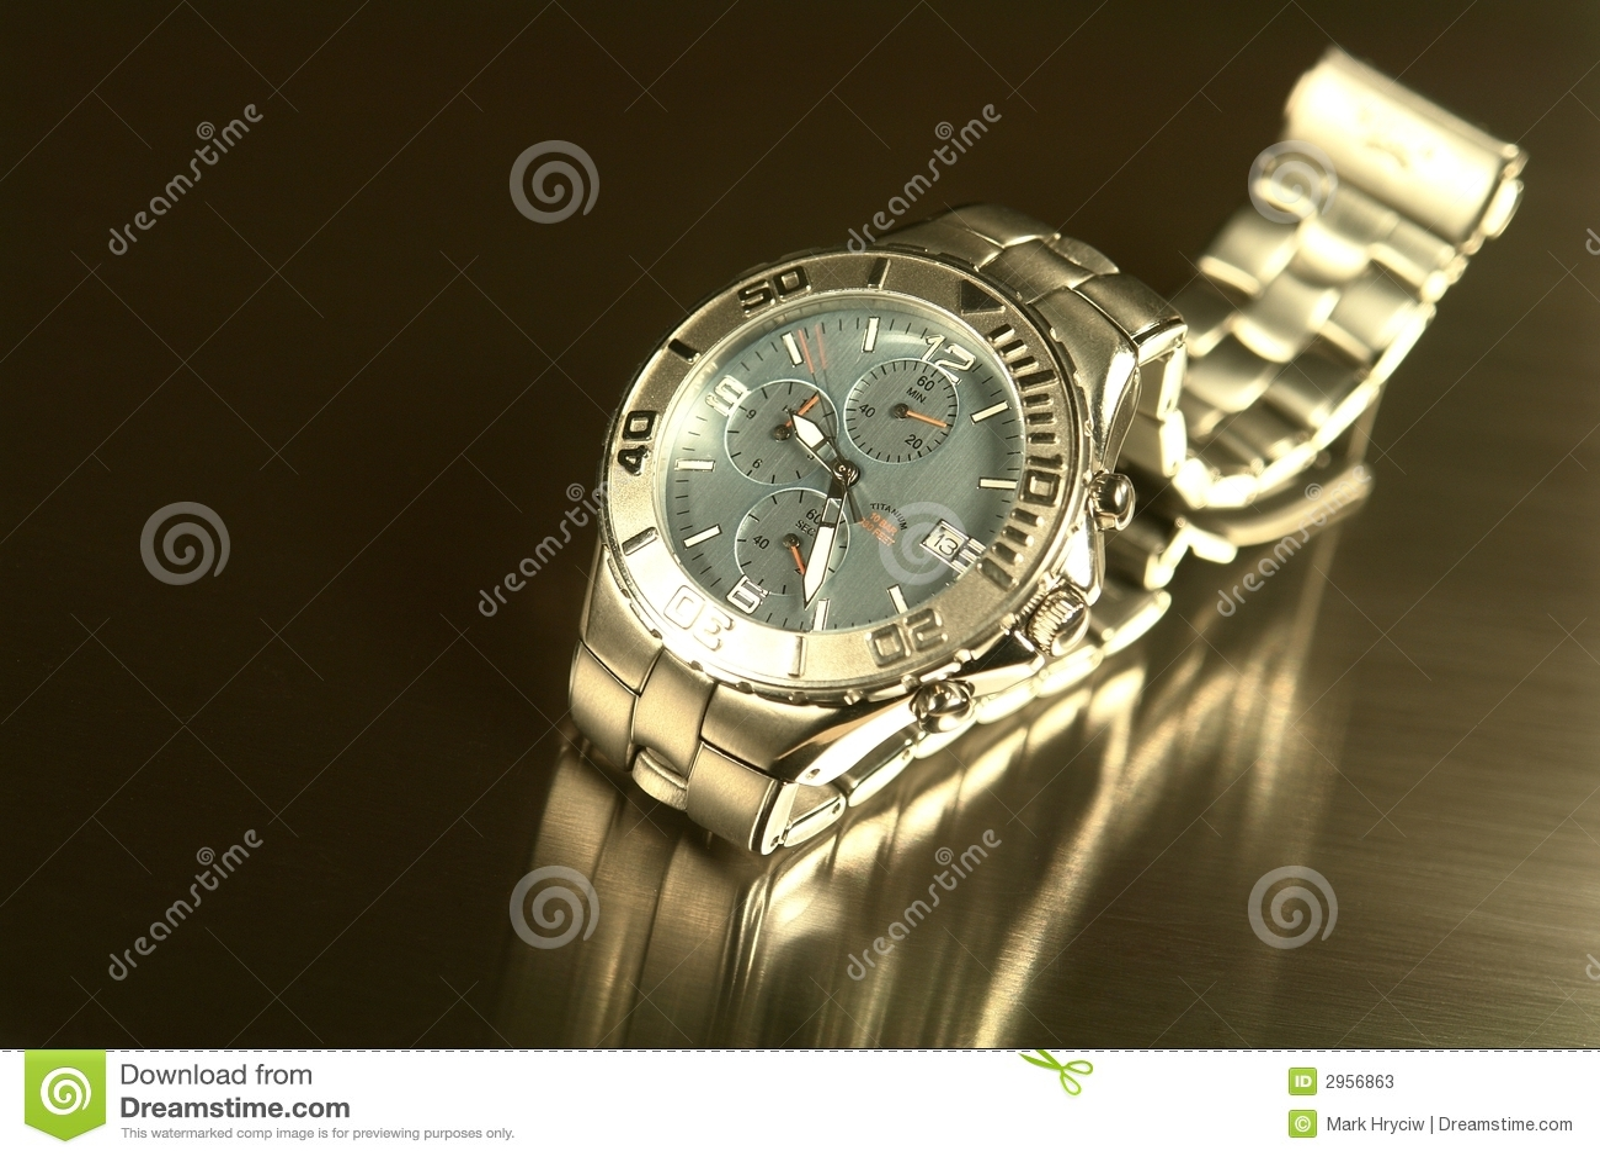 Titanium watch